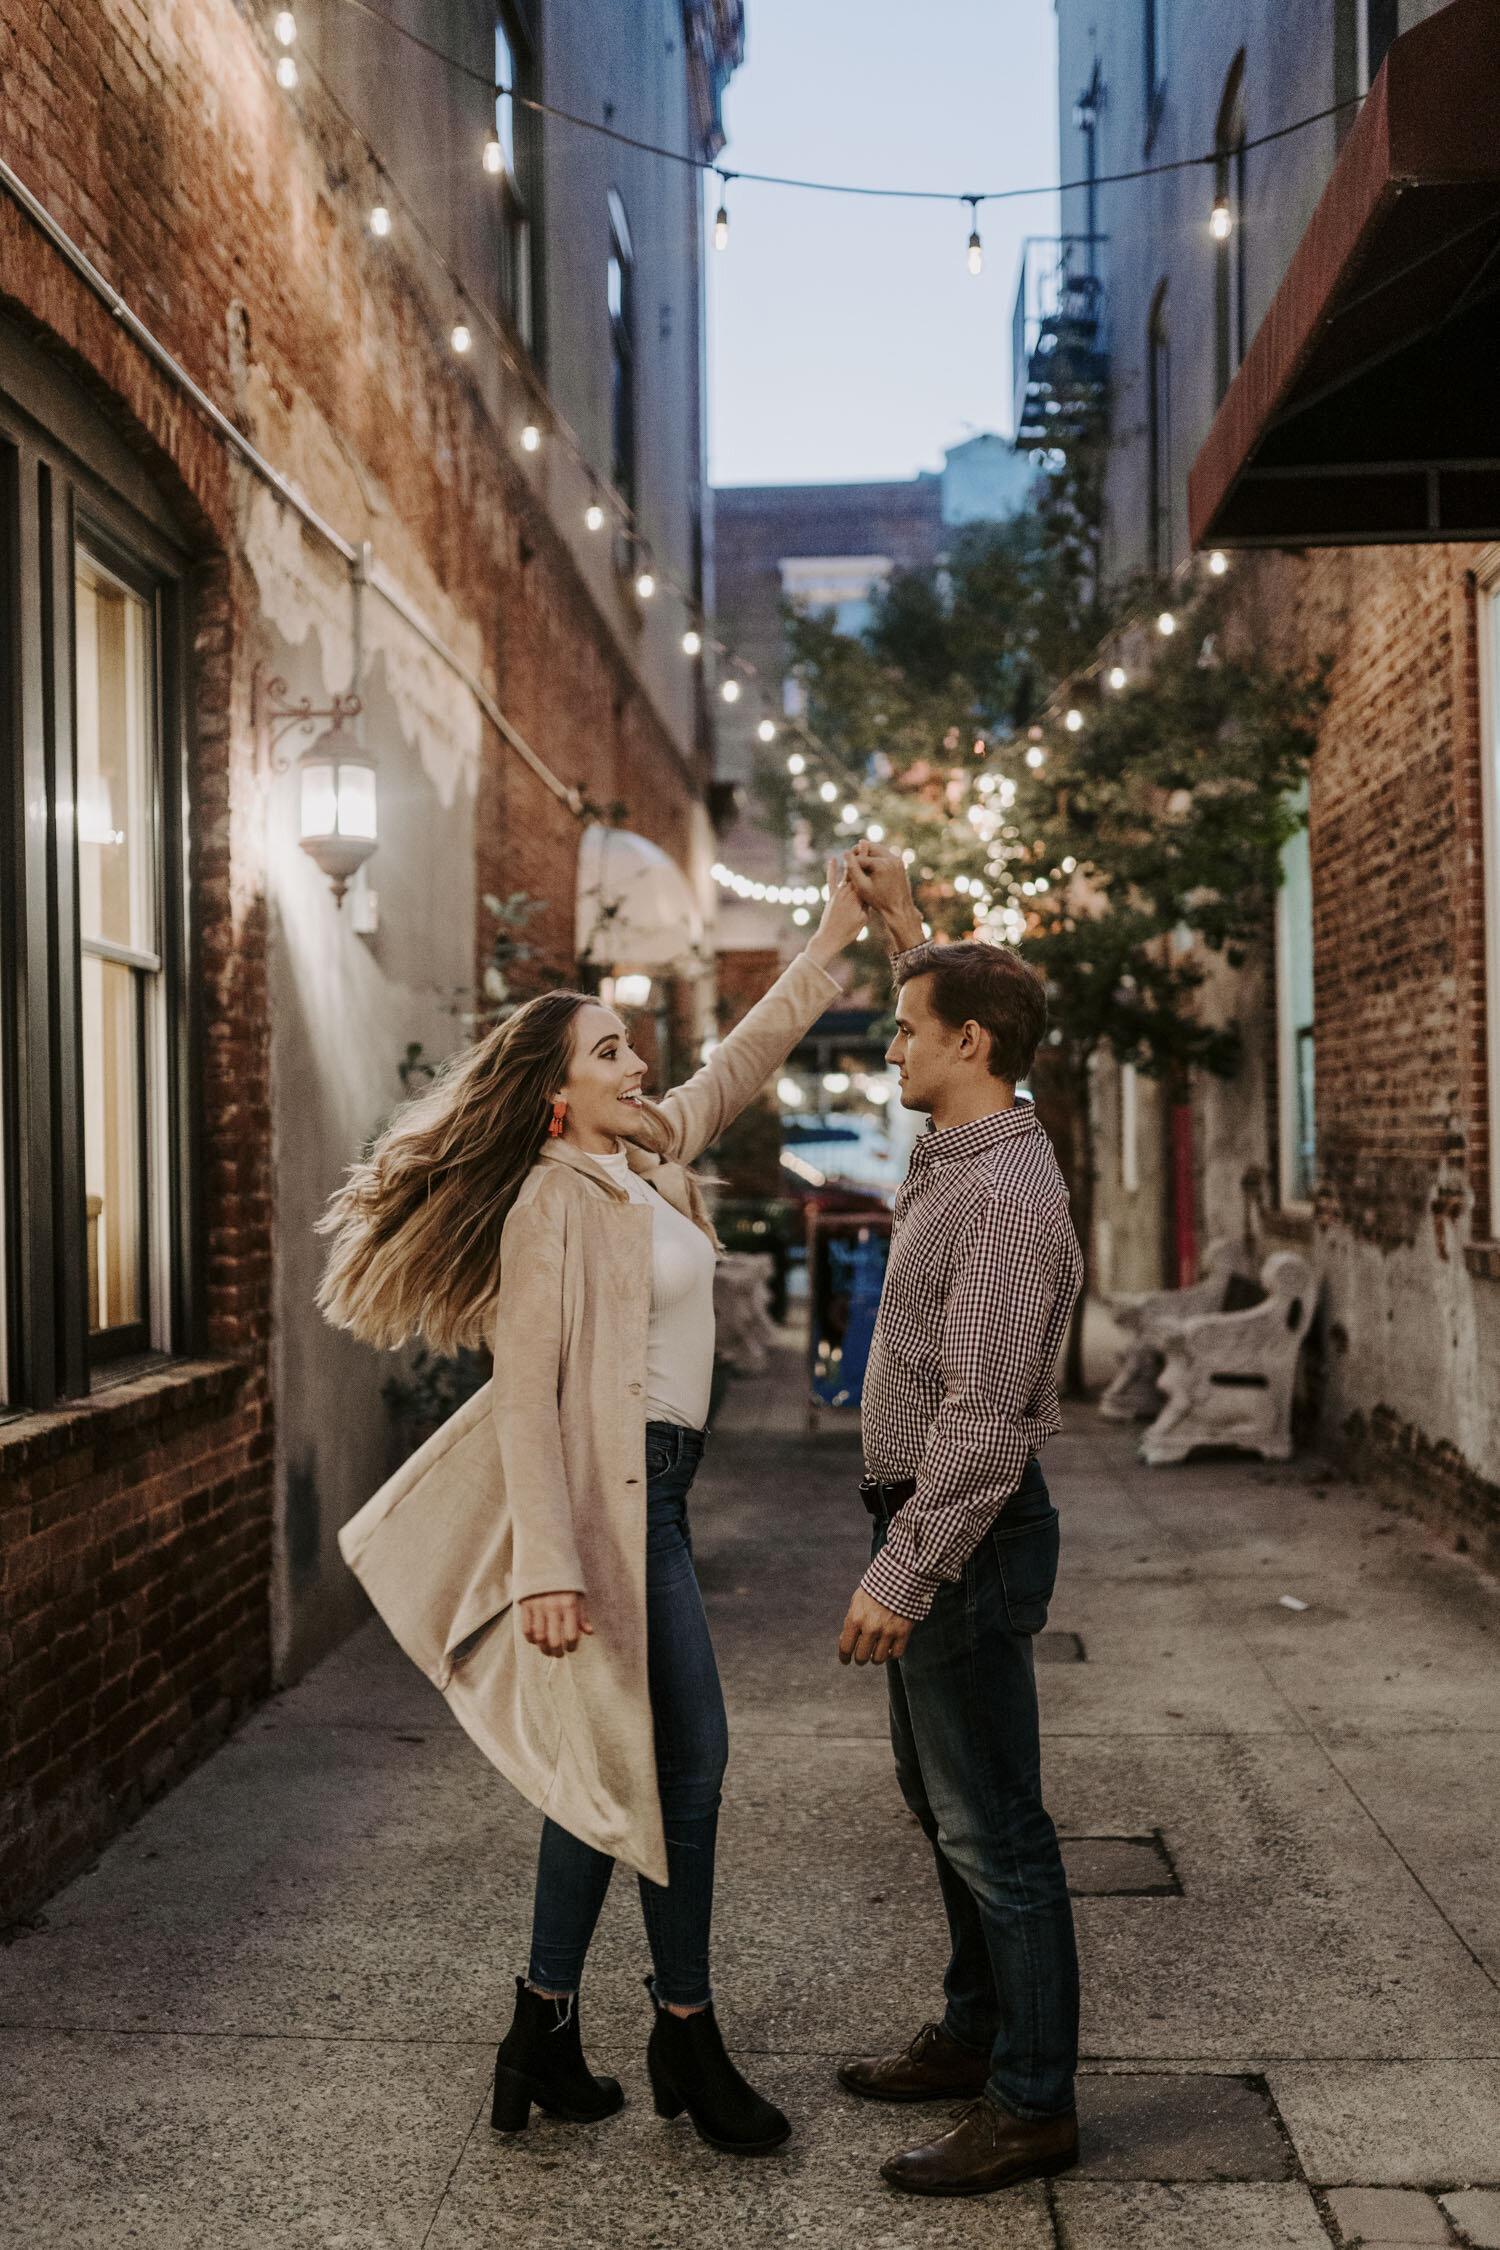 Downtown Greensboro, NC Engagement Session by Kayli LaFon Photography   North Carolina Wedding & Elopement Photographer